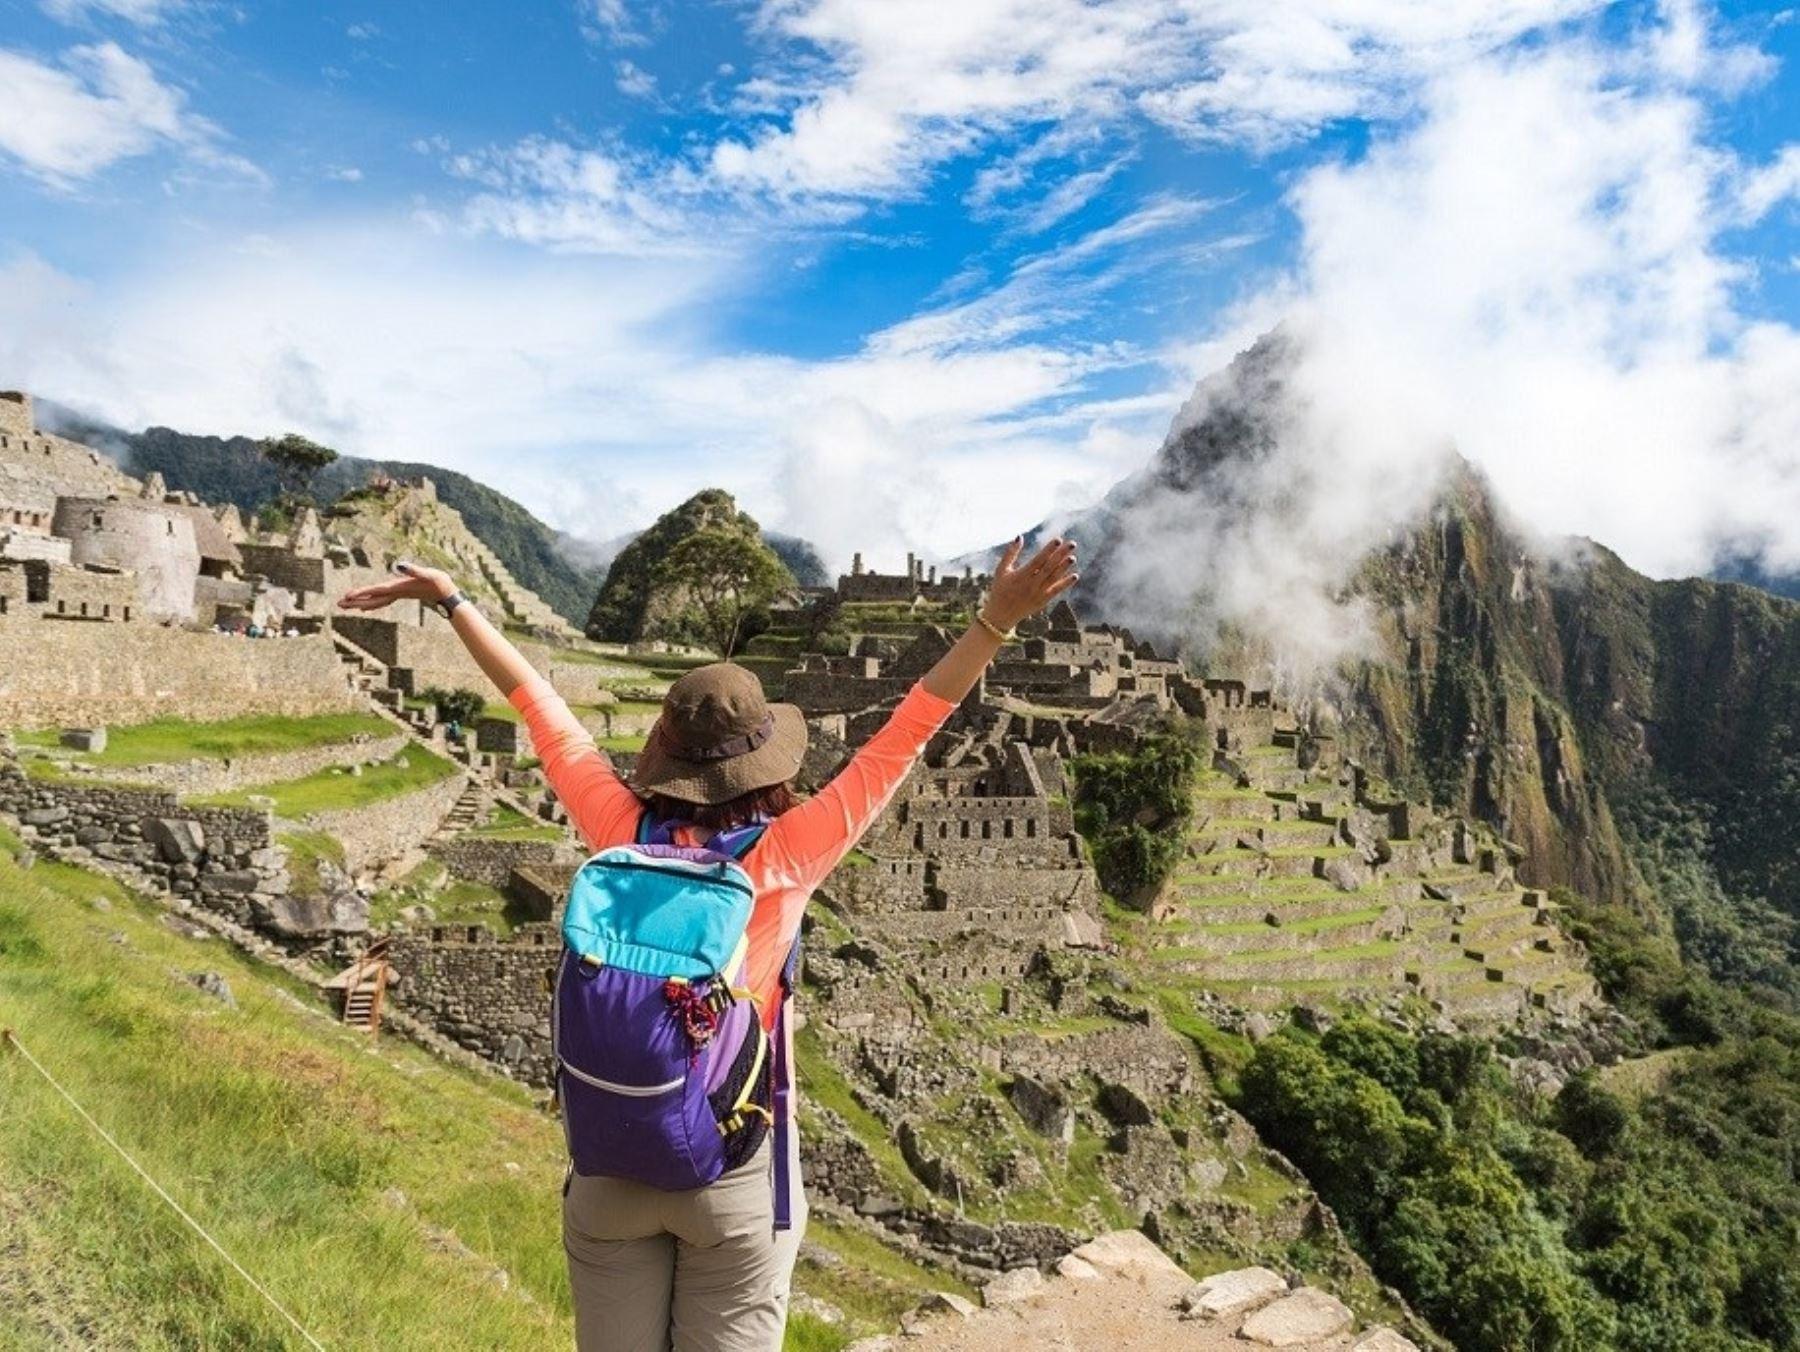 A partir del 1 de noviembre Machu Picchu volverá a recibir a visitantes después de más de siete meses. ANDINA/Difusión